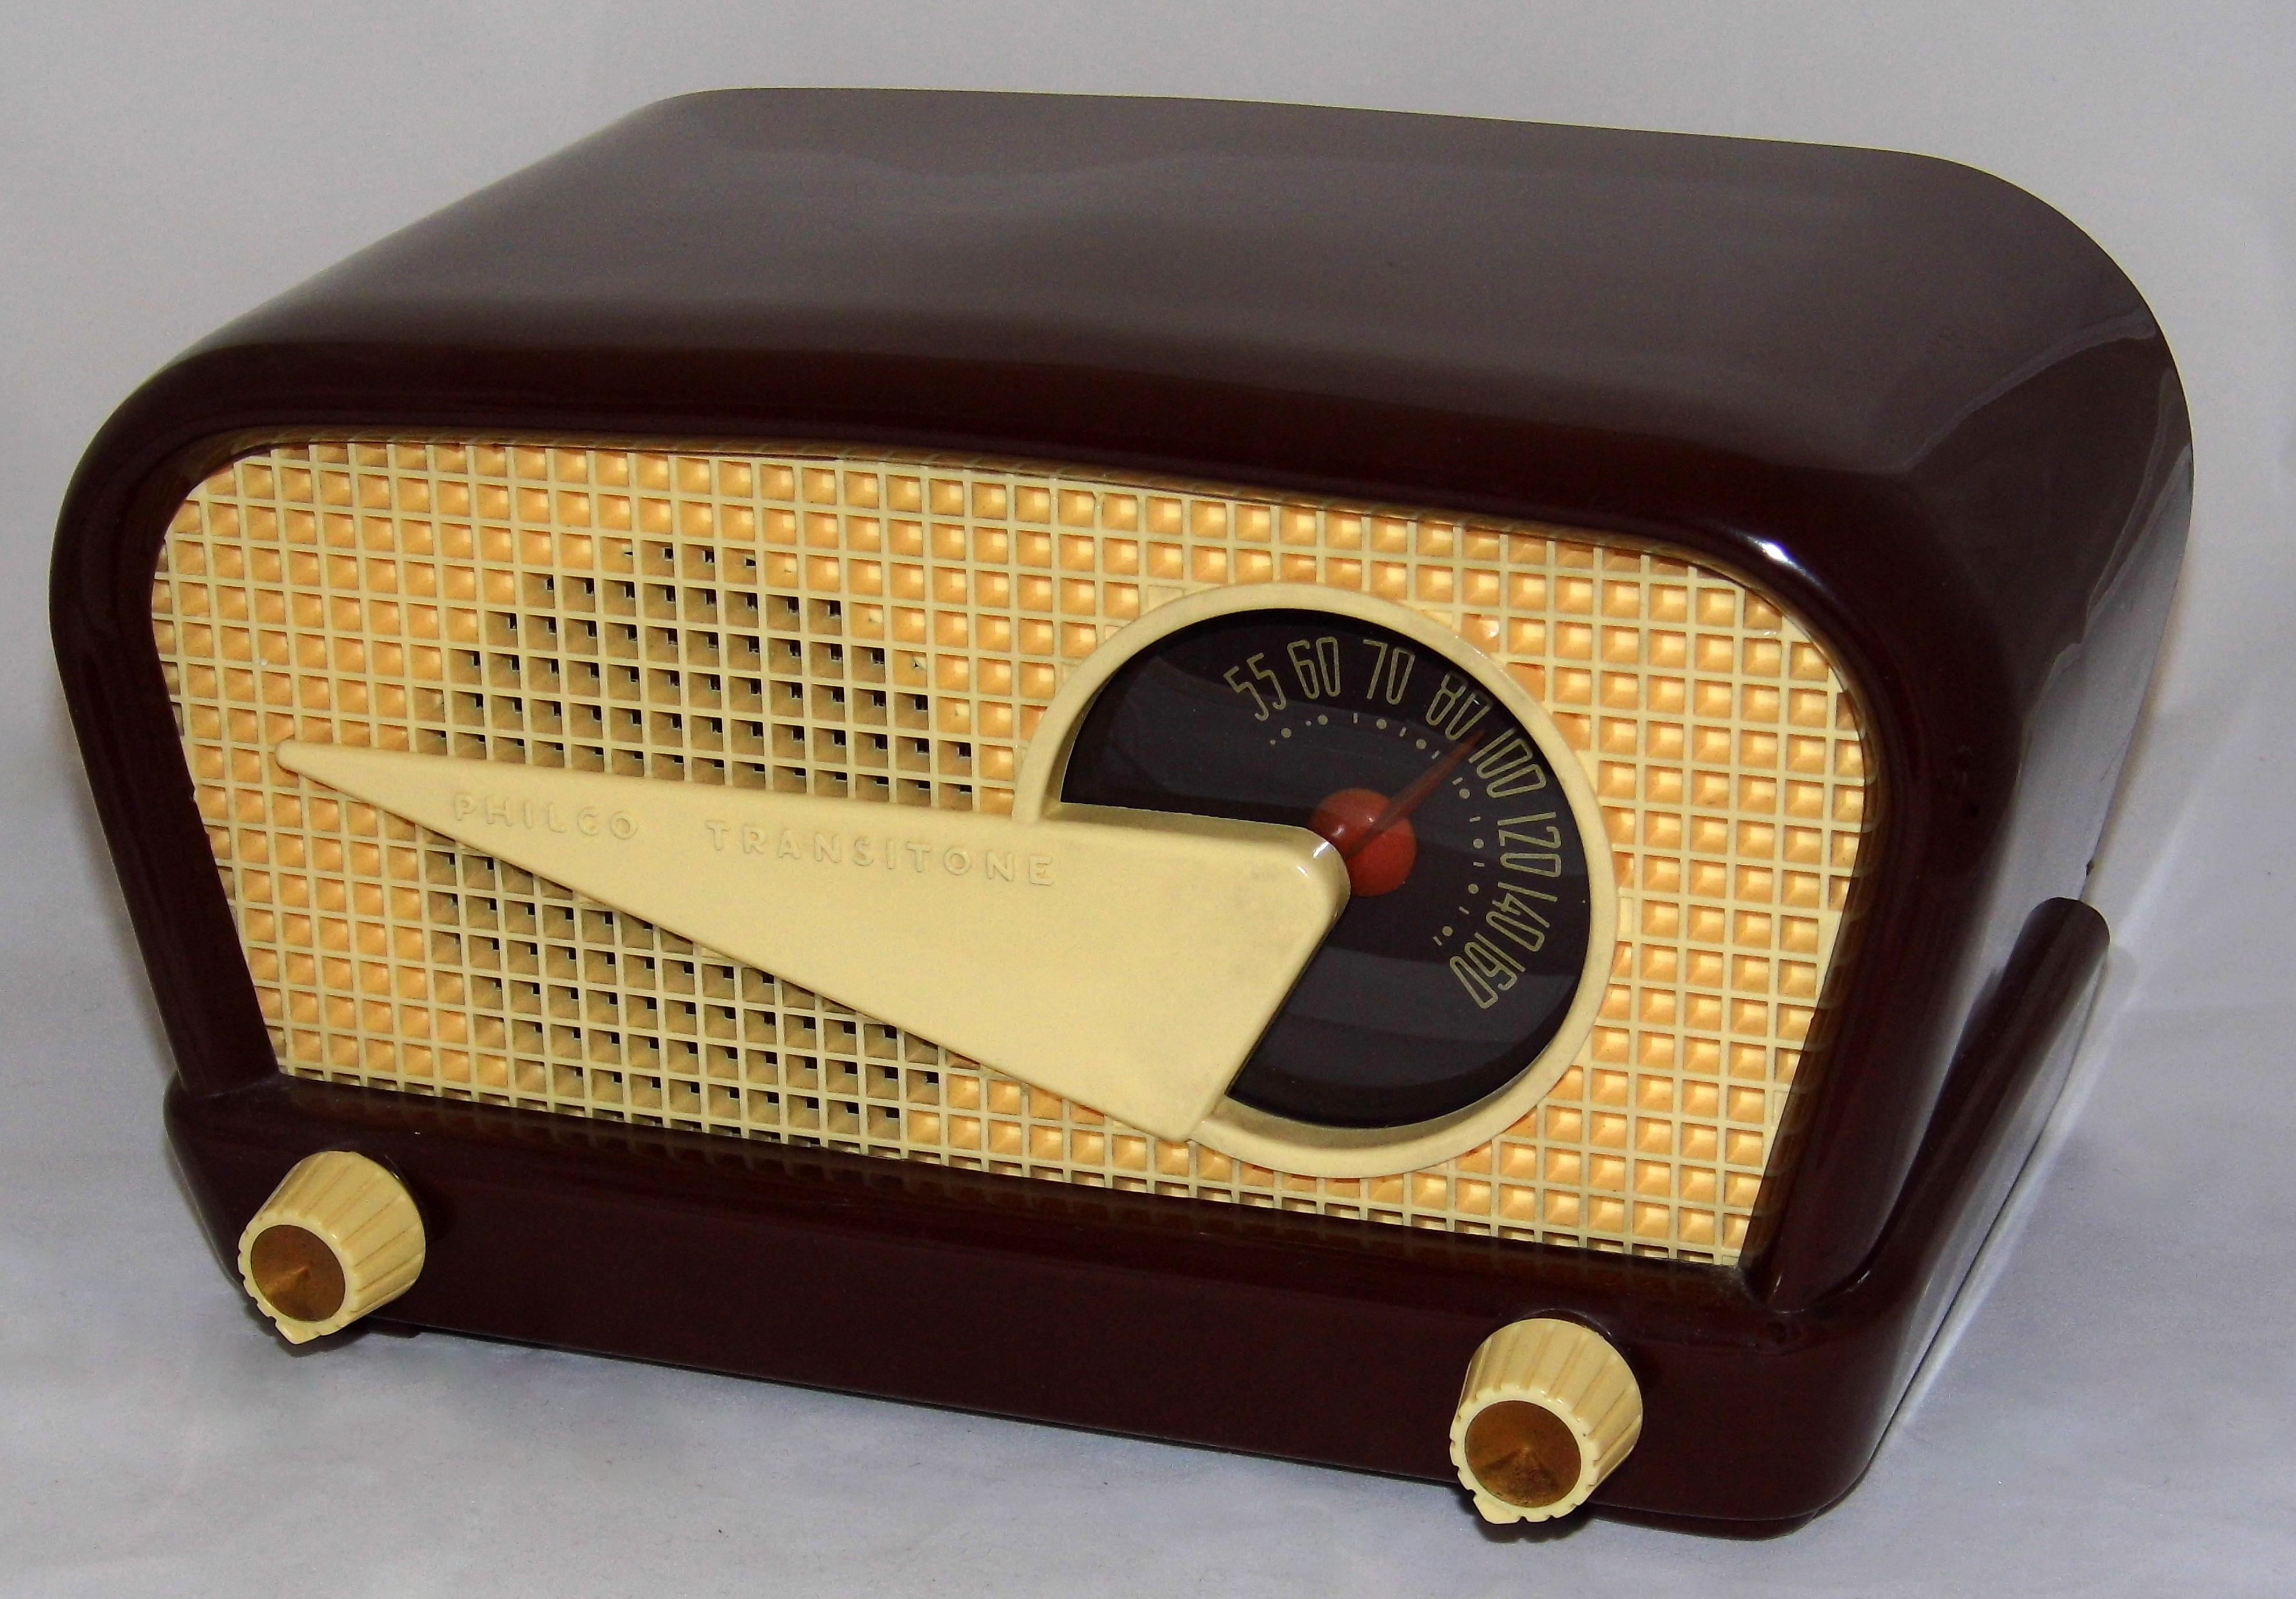 FileVintage Philco Transitone Flying Wedge Table Radio Model 48